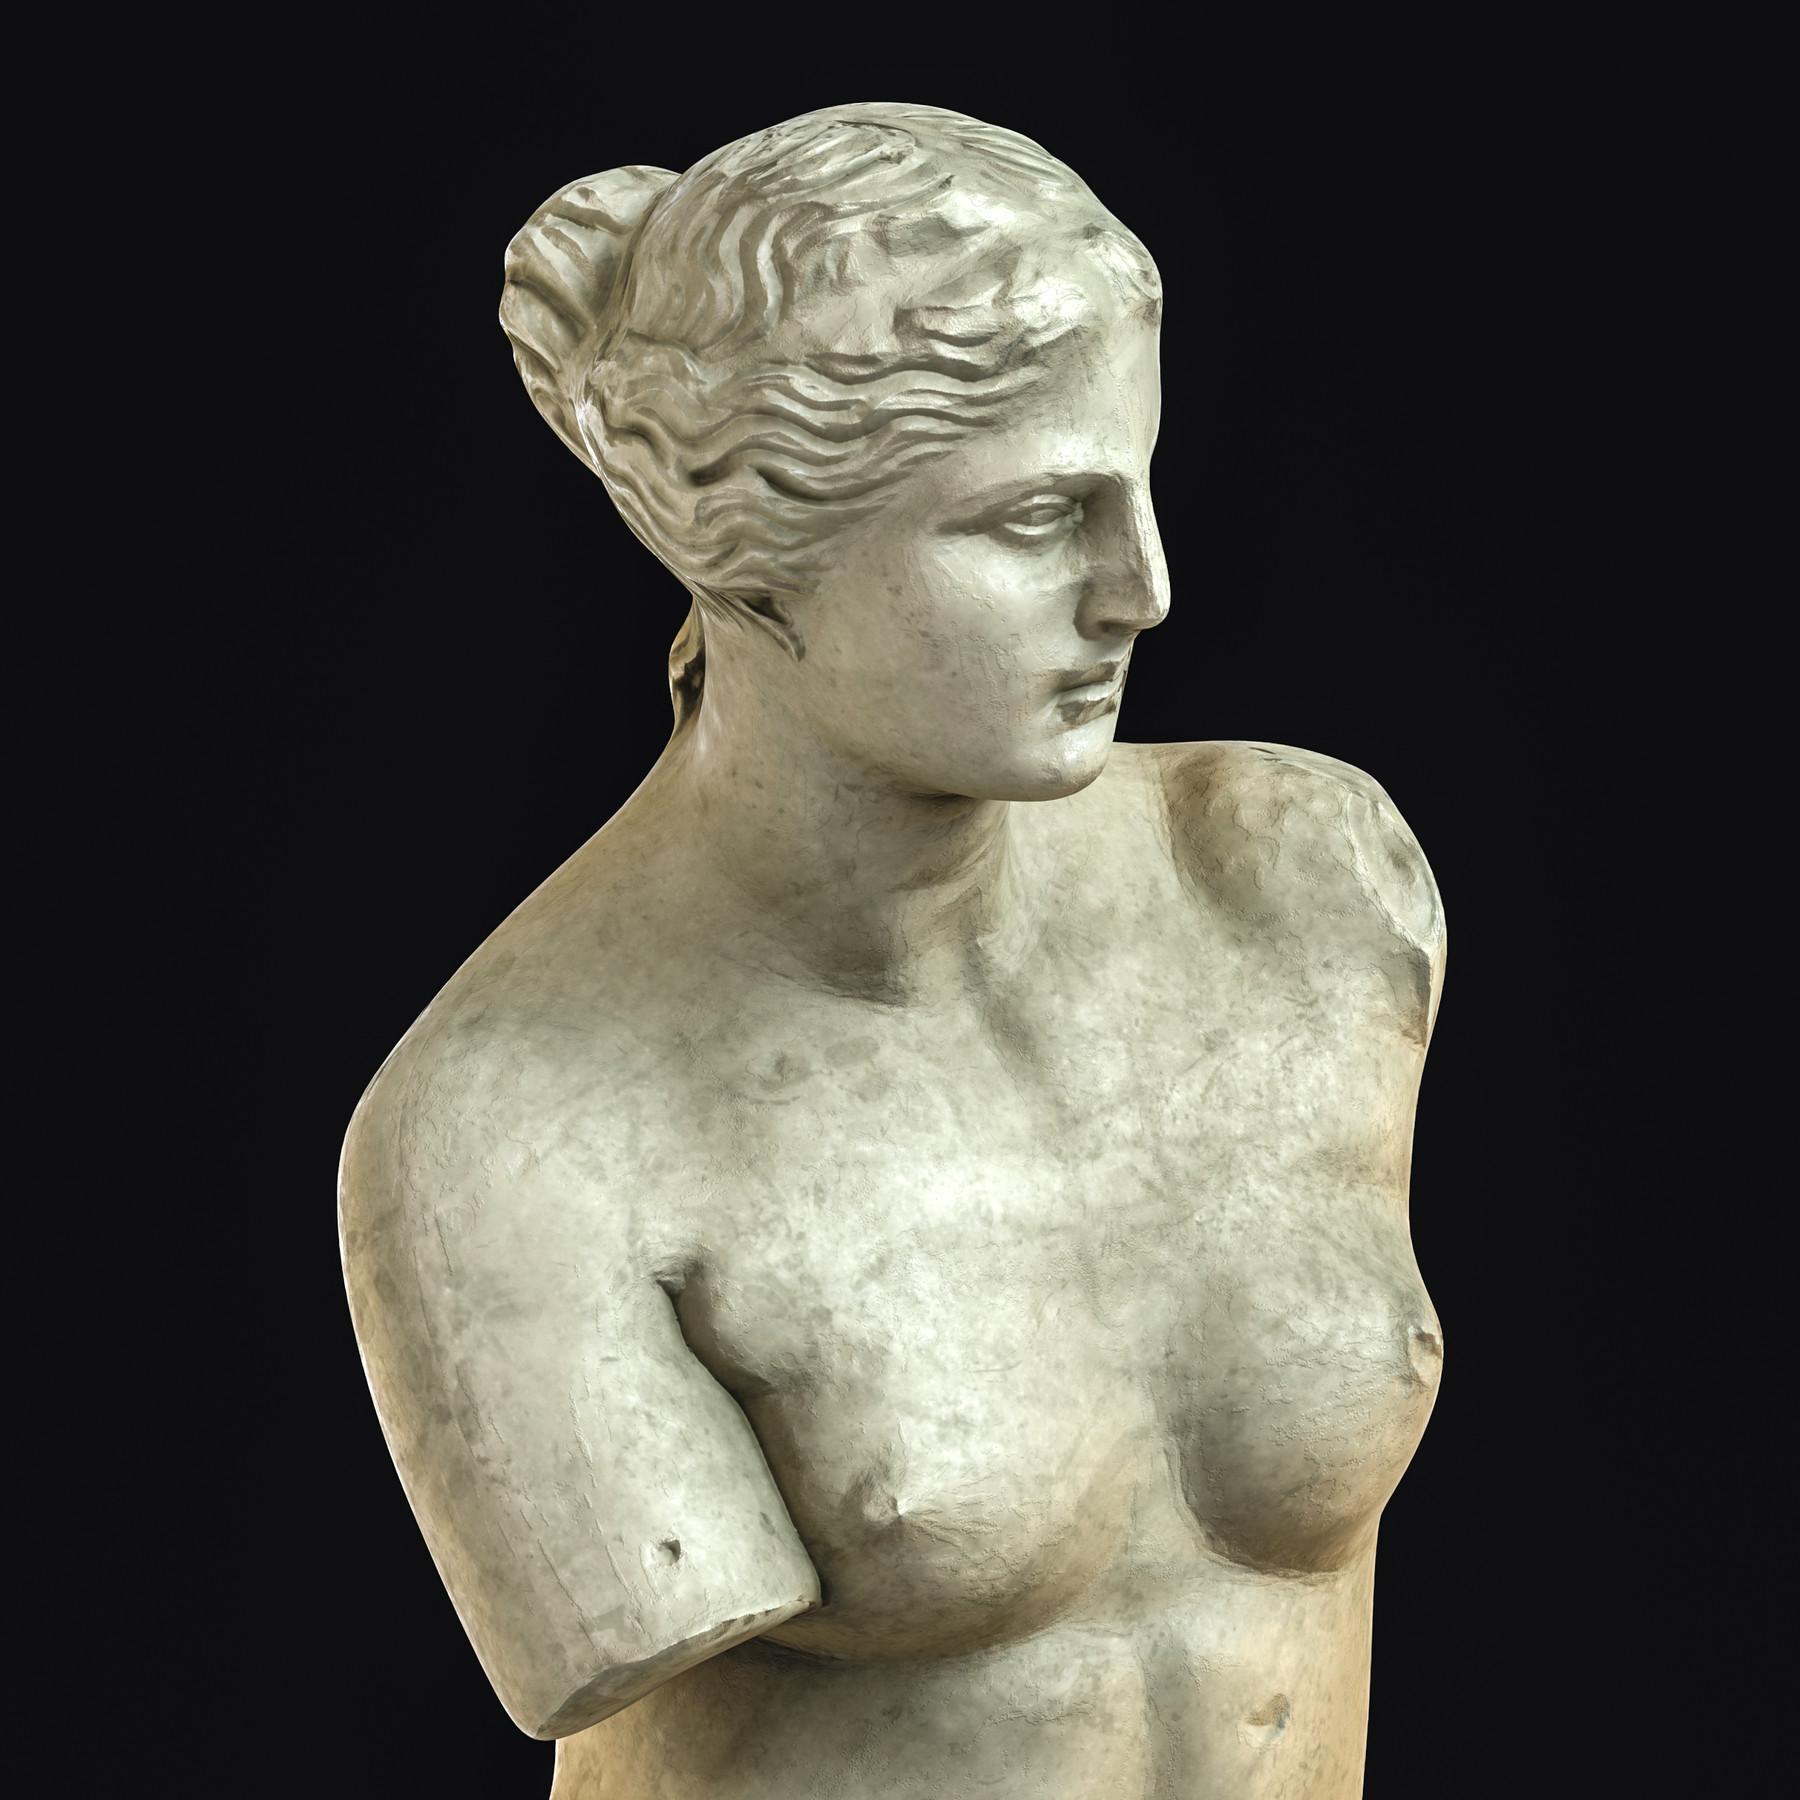 ArtStation - Venus De Milo / Sculpture / 3D Model